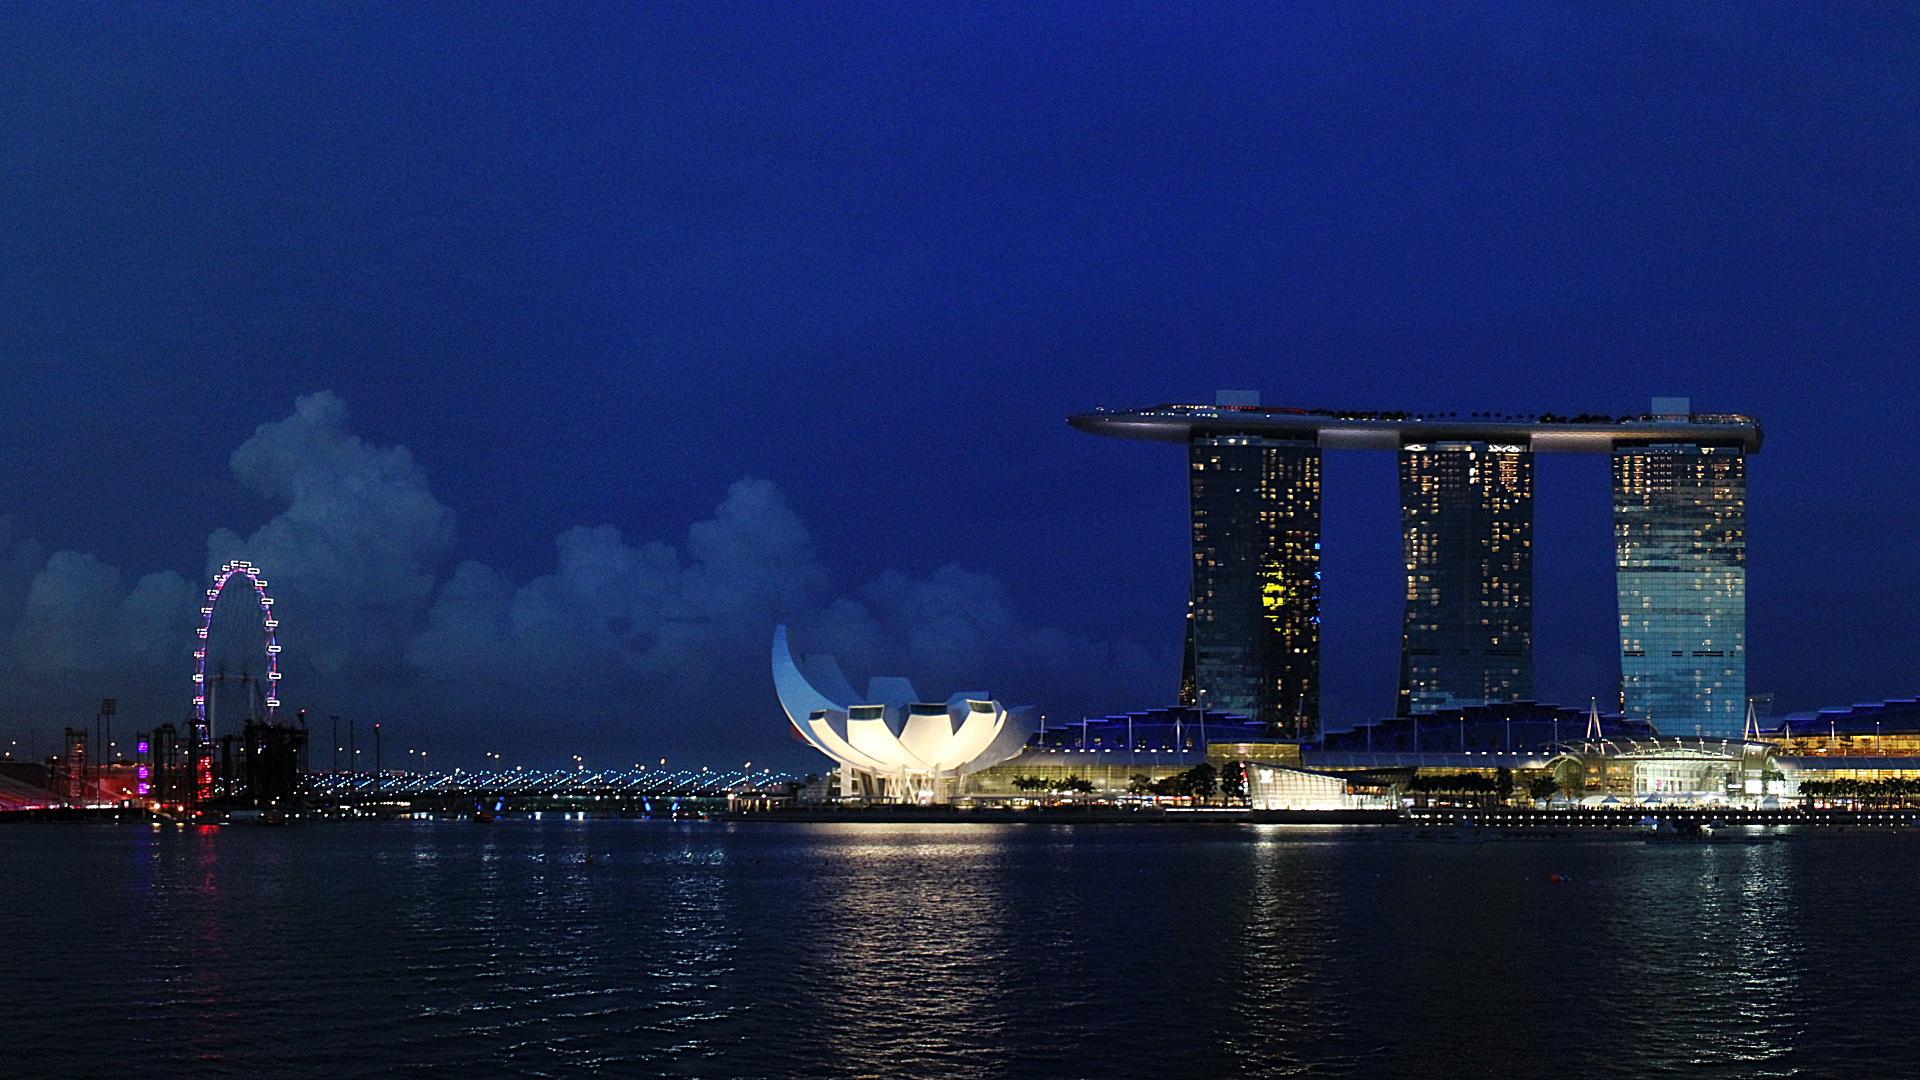 The Rock Hd Wallpapers 1080p Marina Bay Sands Desktop Wallpaper Ojdo